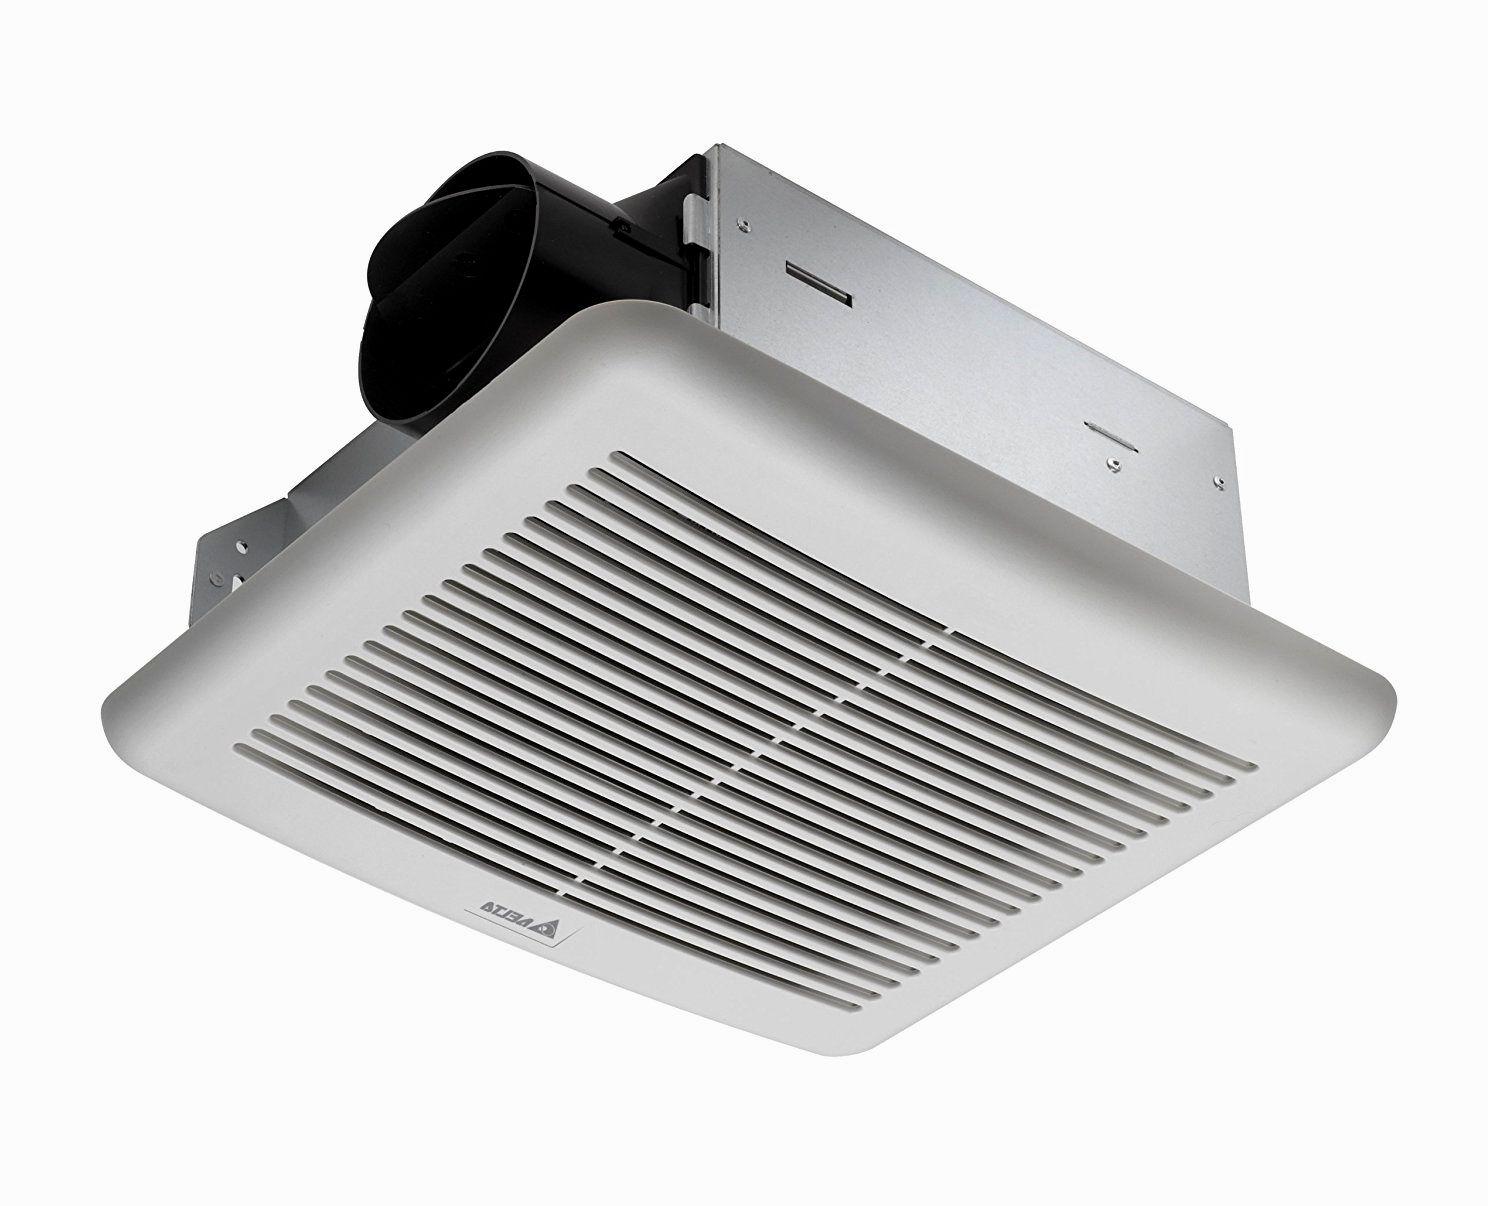 Contemporary Panasonic Bathroom Exhaust Fan with Light ...